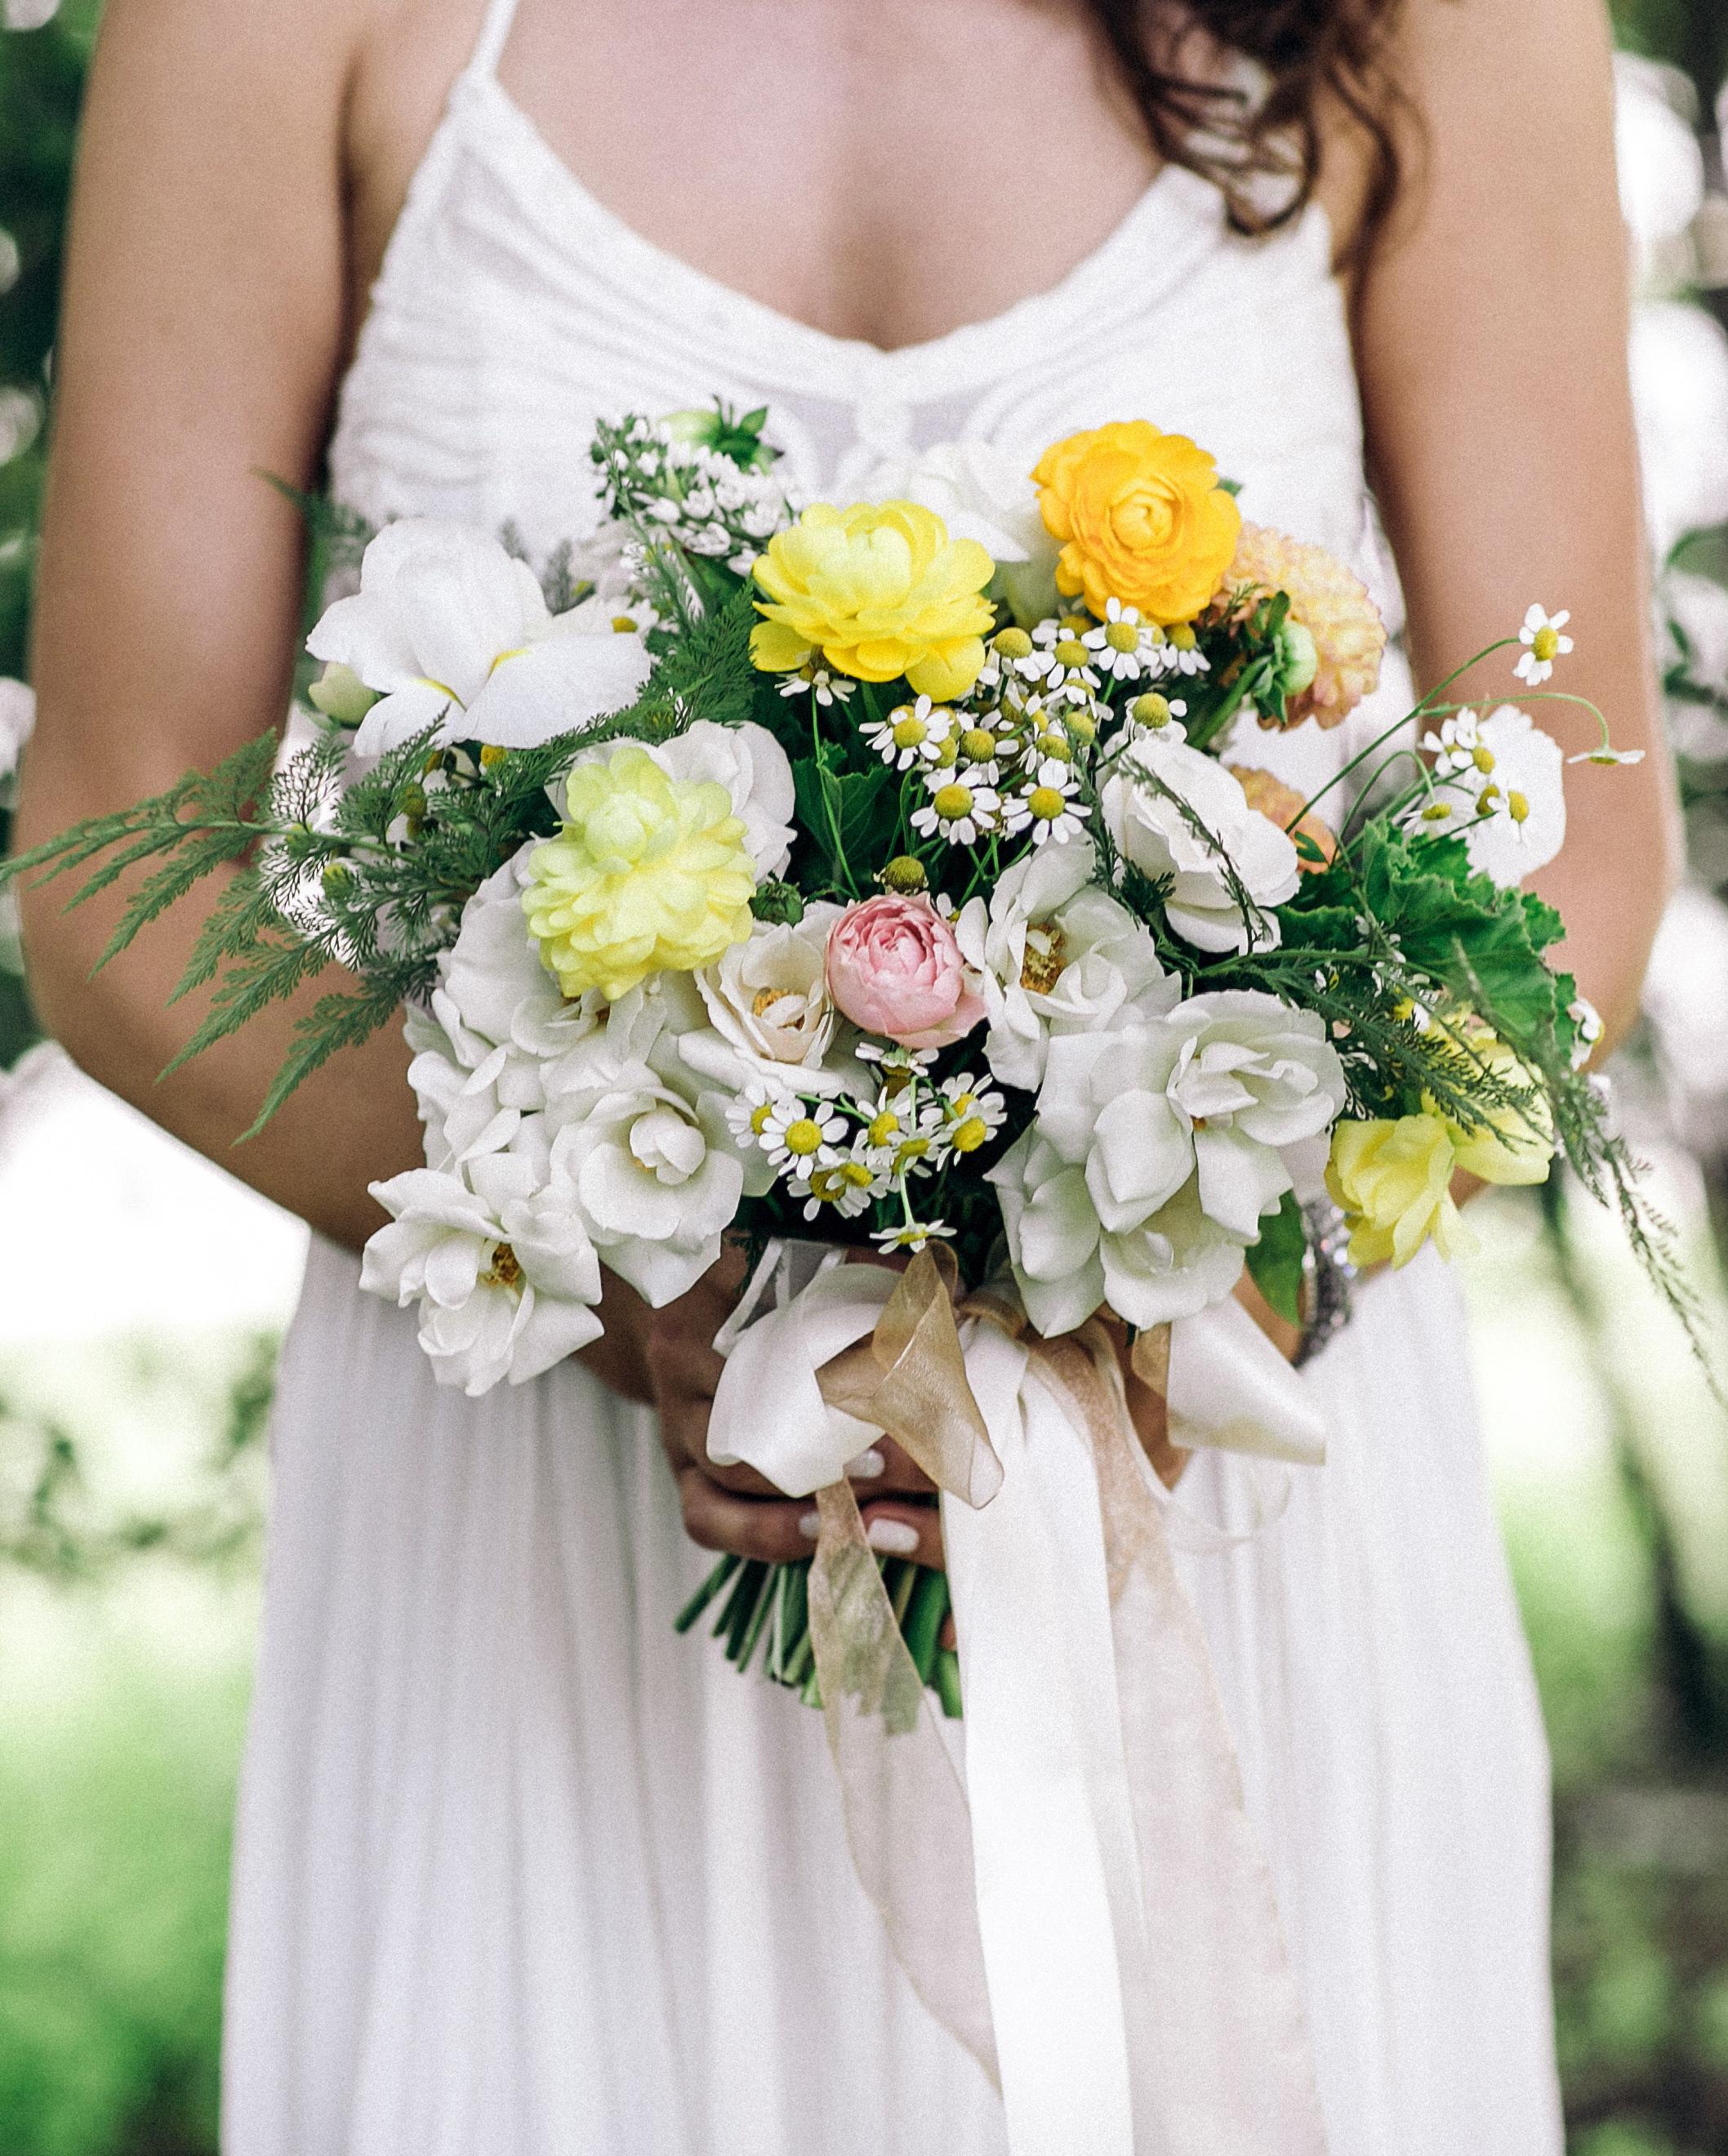 sadie-brandon-wedding-bouquet-66-ss112173-0915.jpg